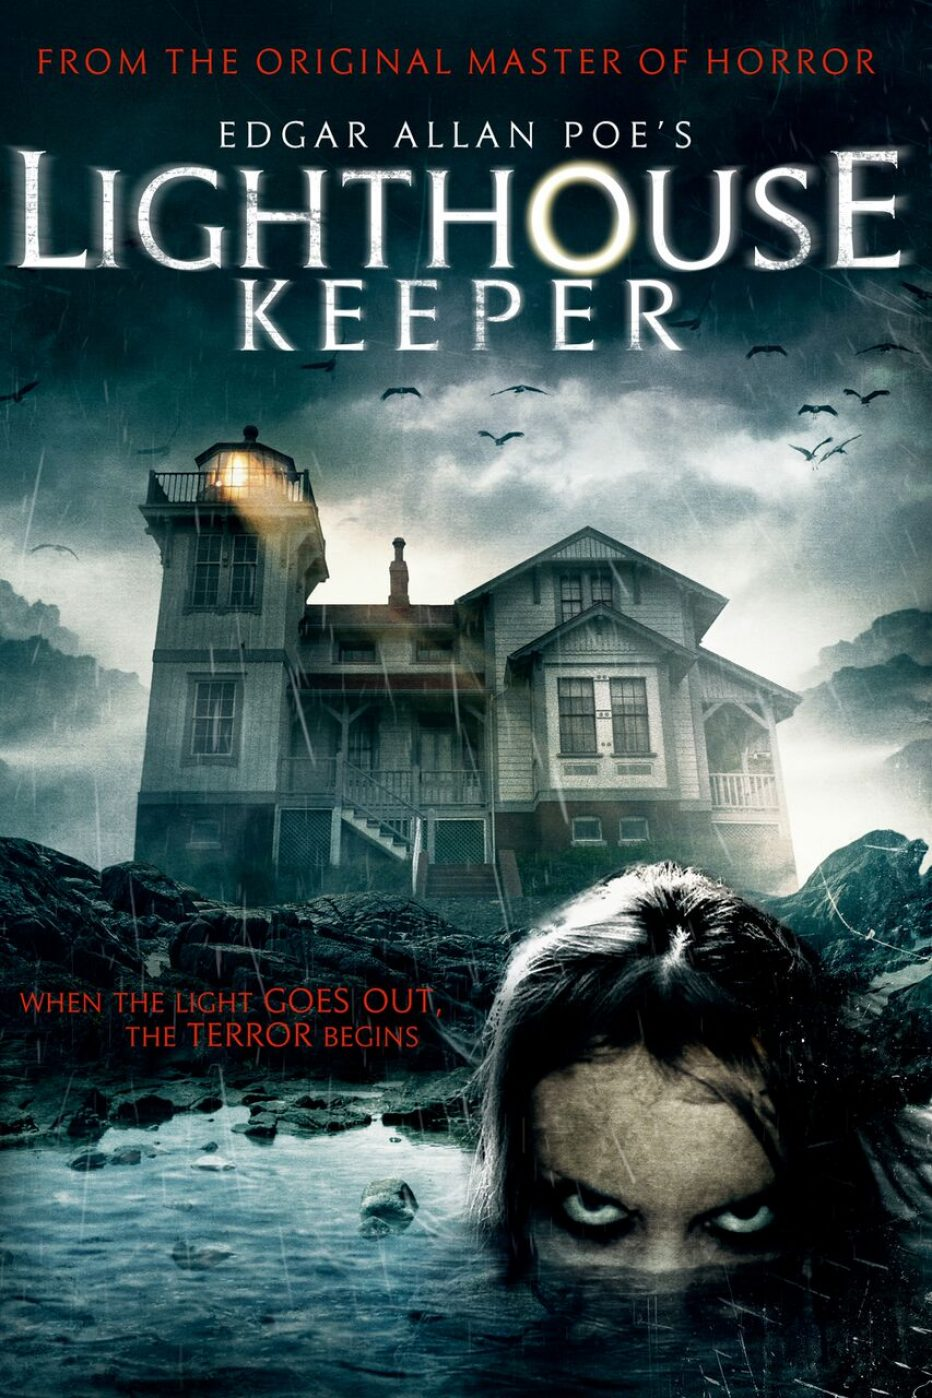 Edgar Allan Poe's Lighthouse Keeper (2016) Review